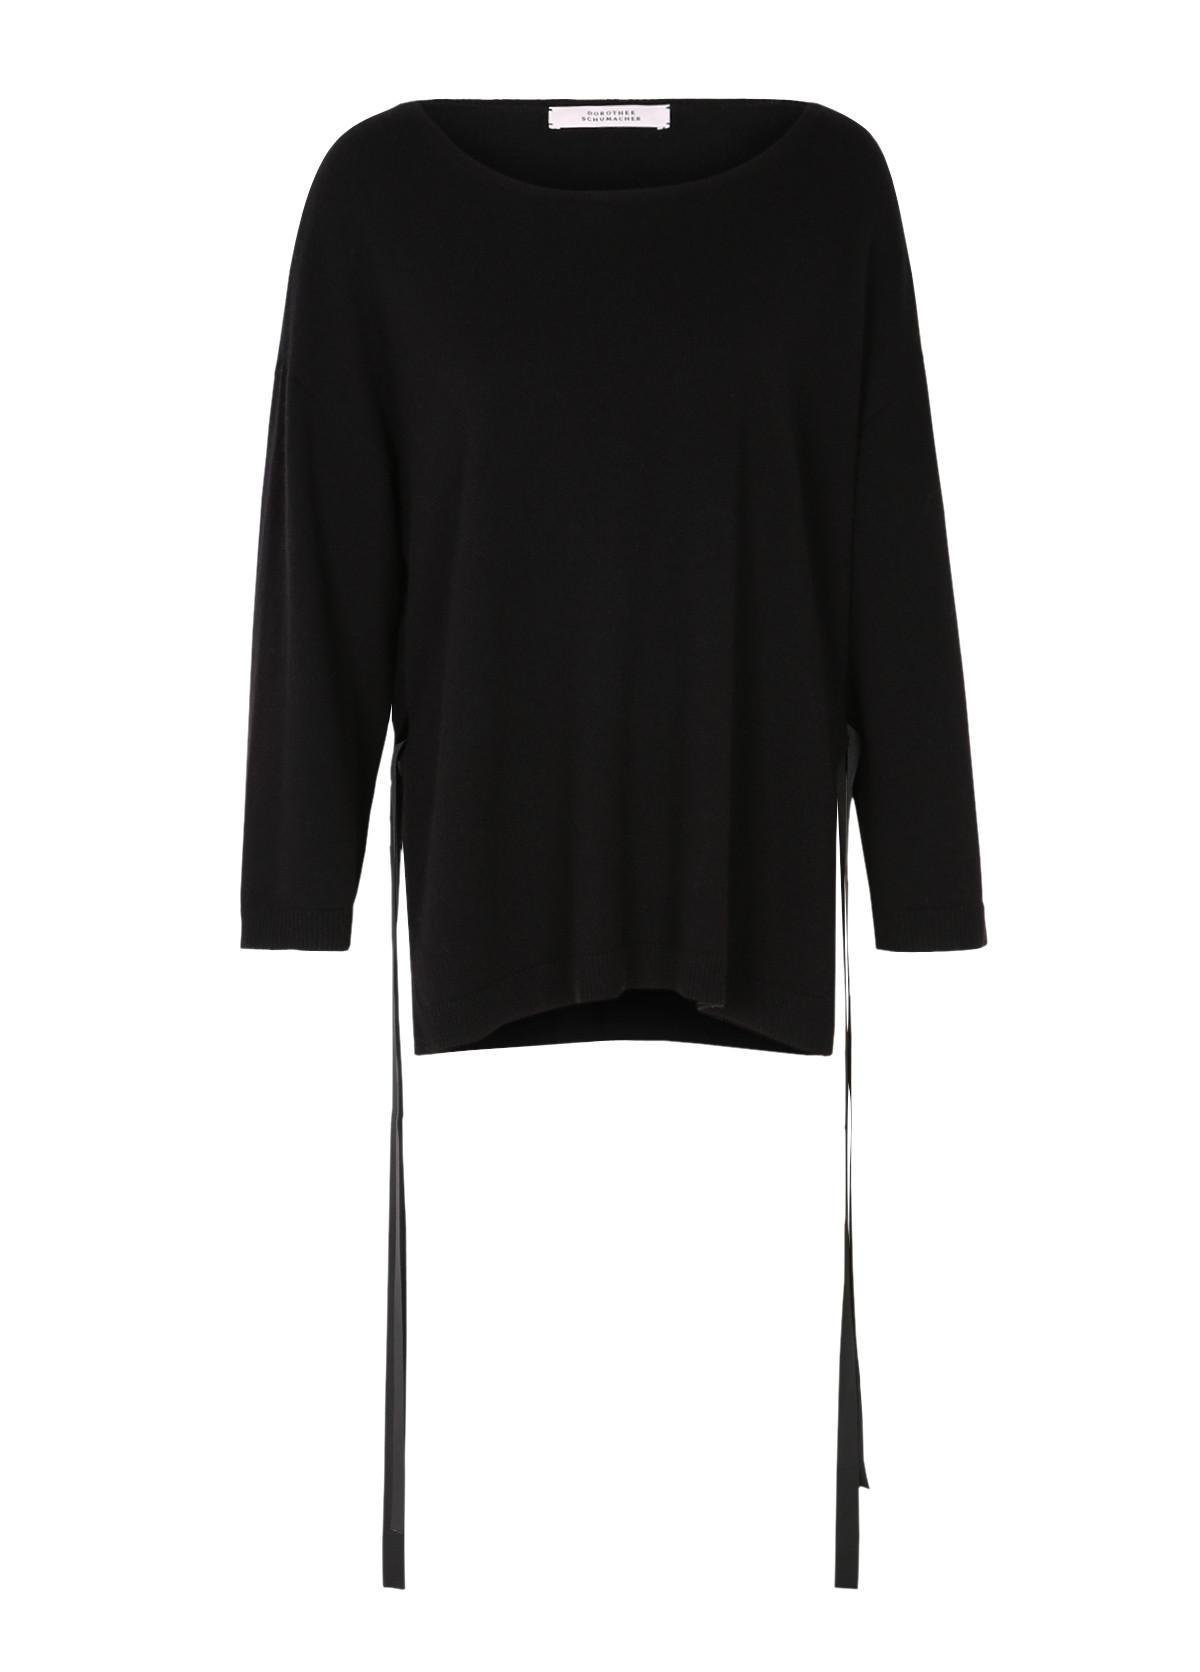 dorothee schumacher vivid dream pullover 7 8 in black lyst. Black Bedroom Furniture Sets. Home Design Ideas